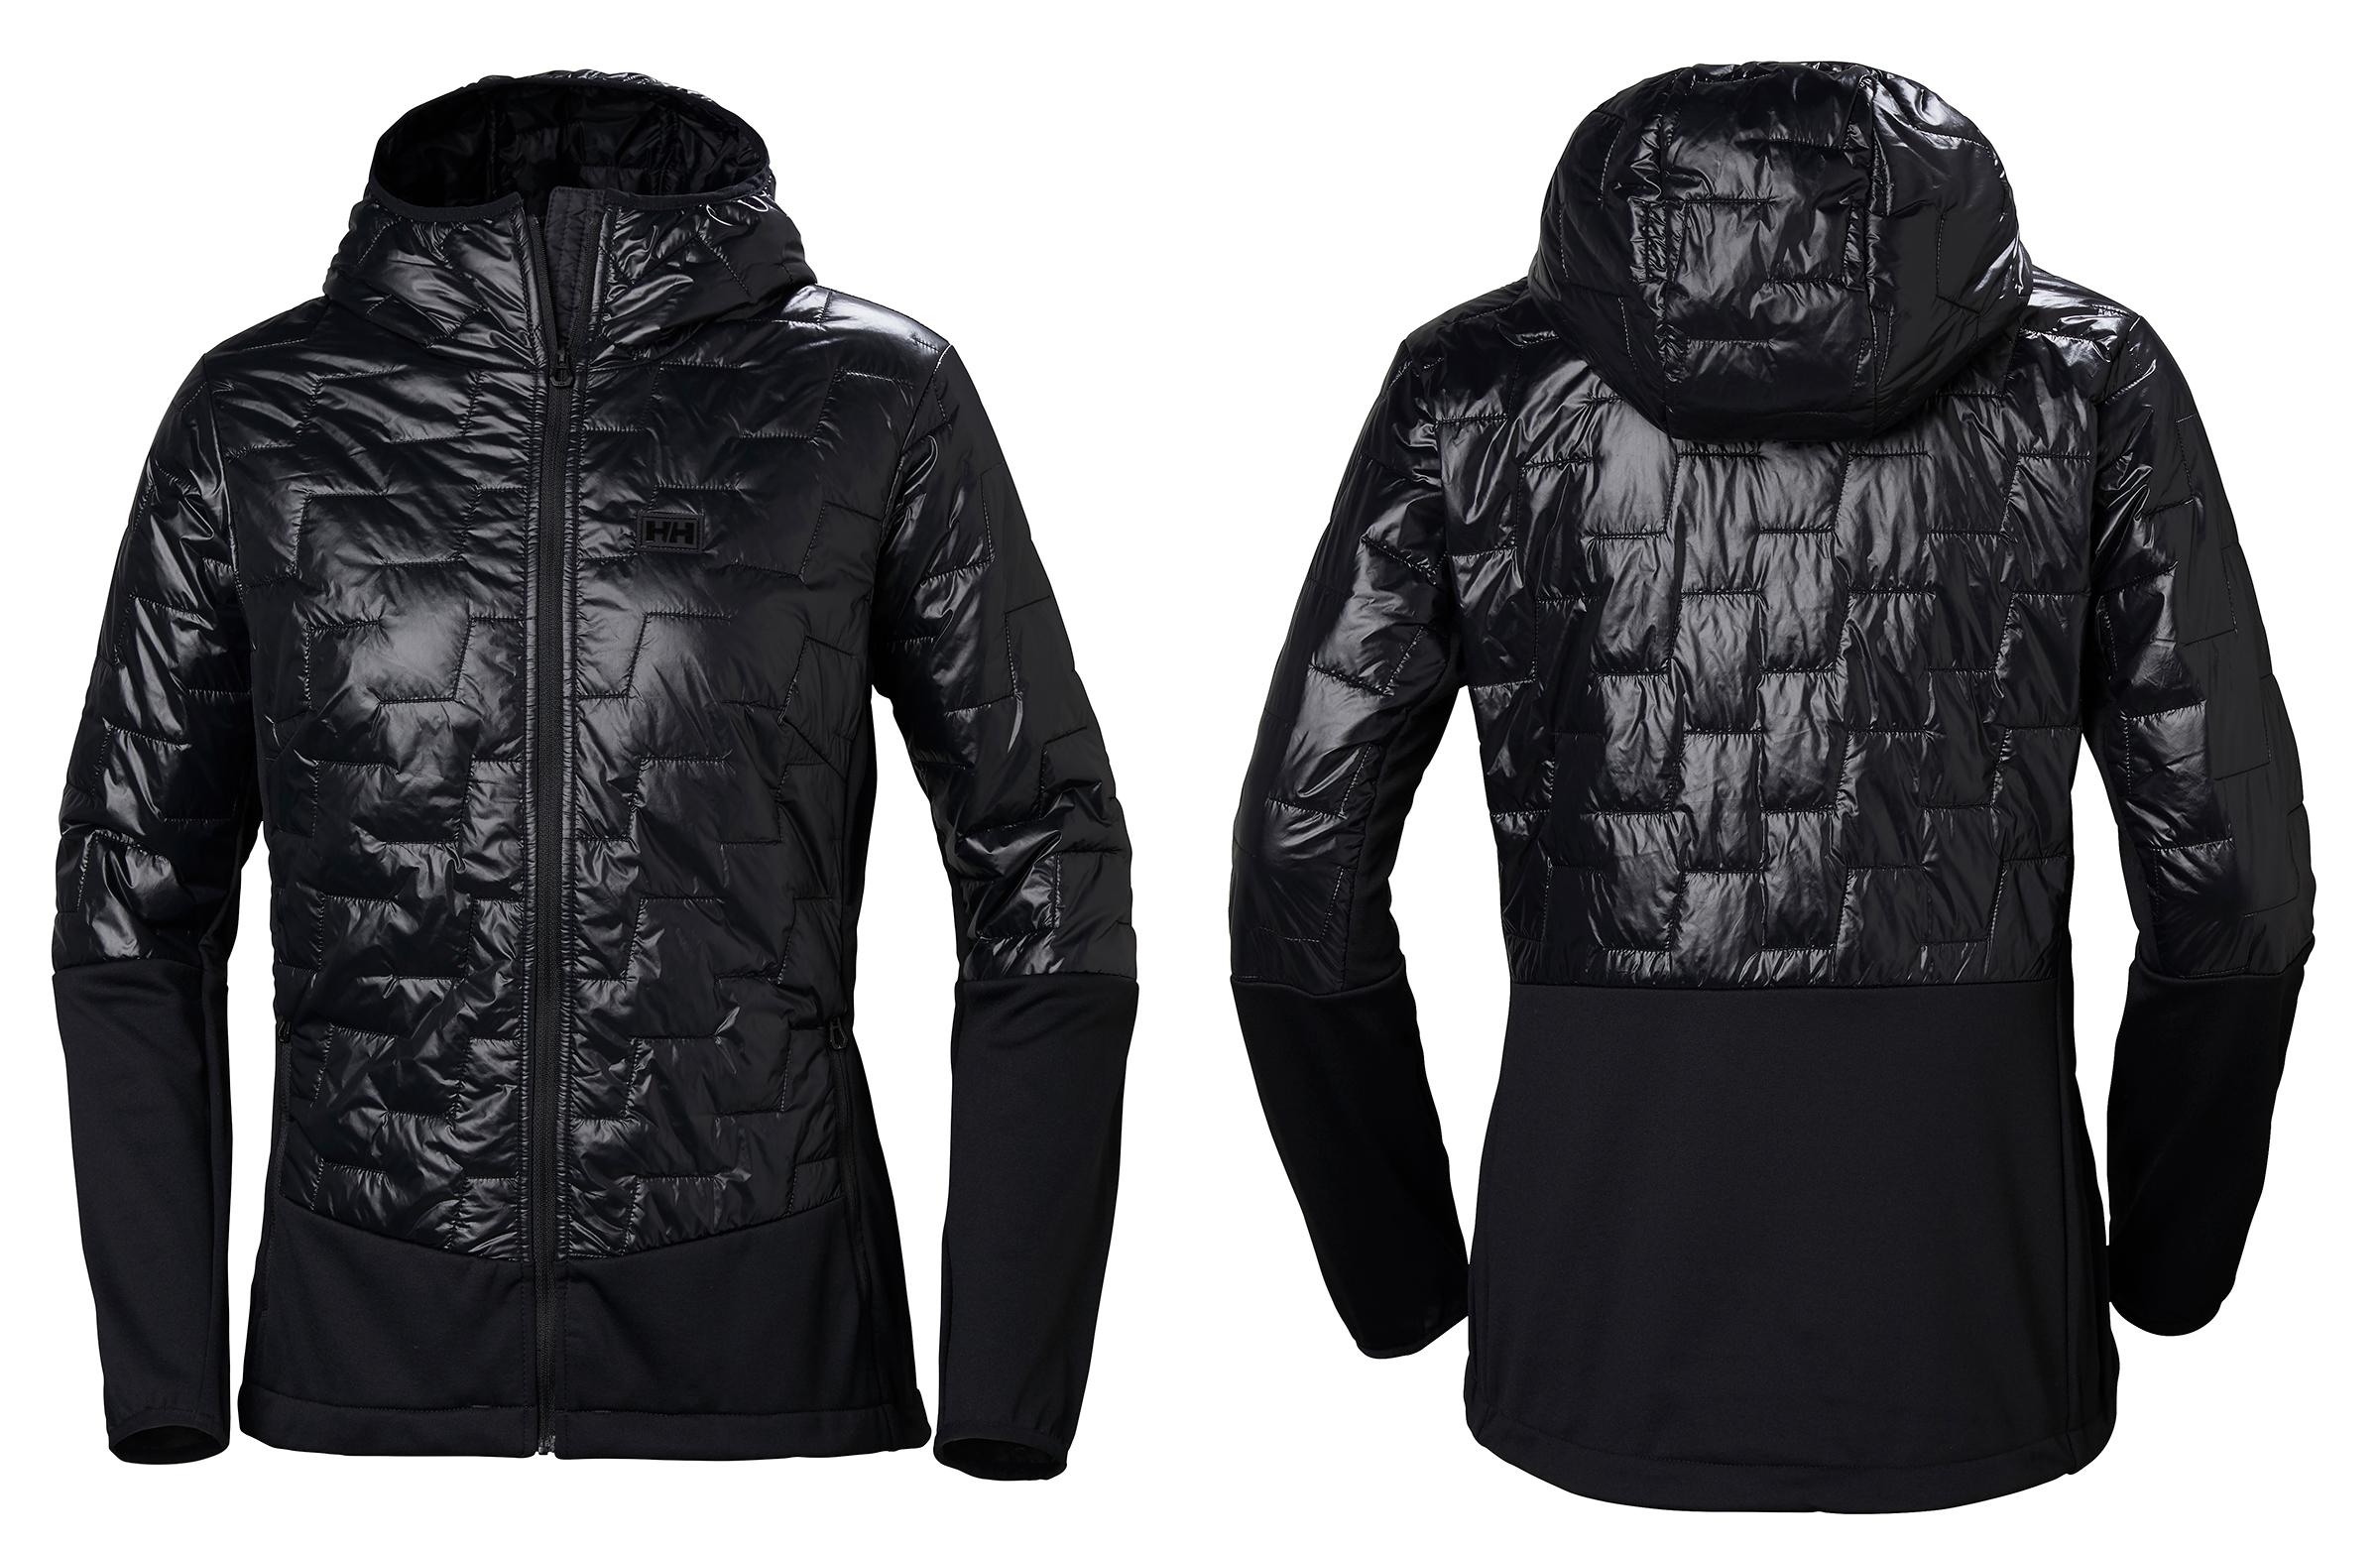 Lifaloft Hybrid Insulatir Jacket